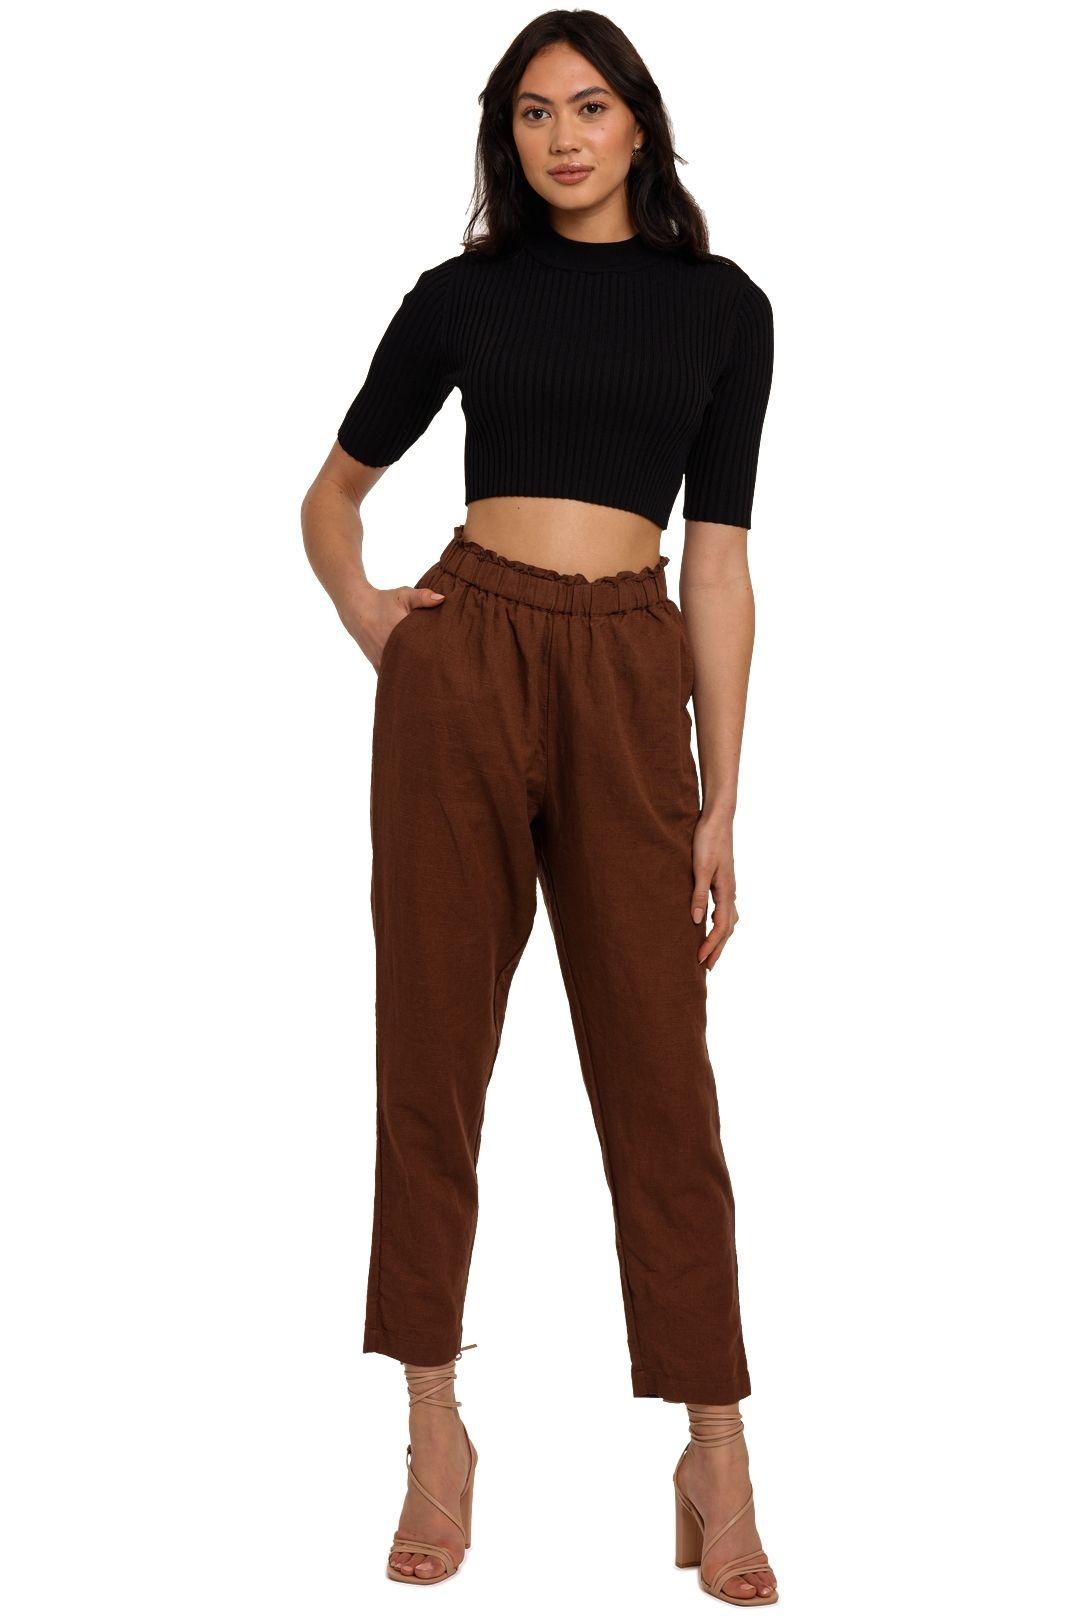 Steele Bane Pant brown